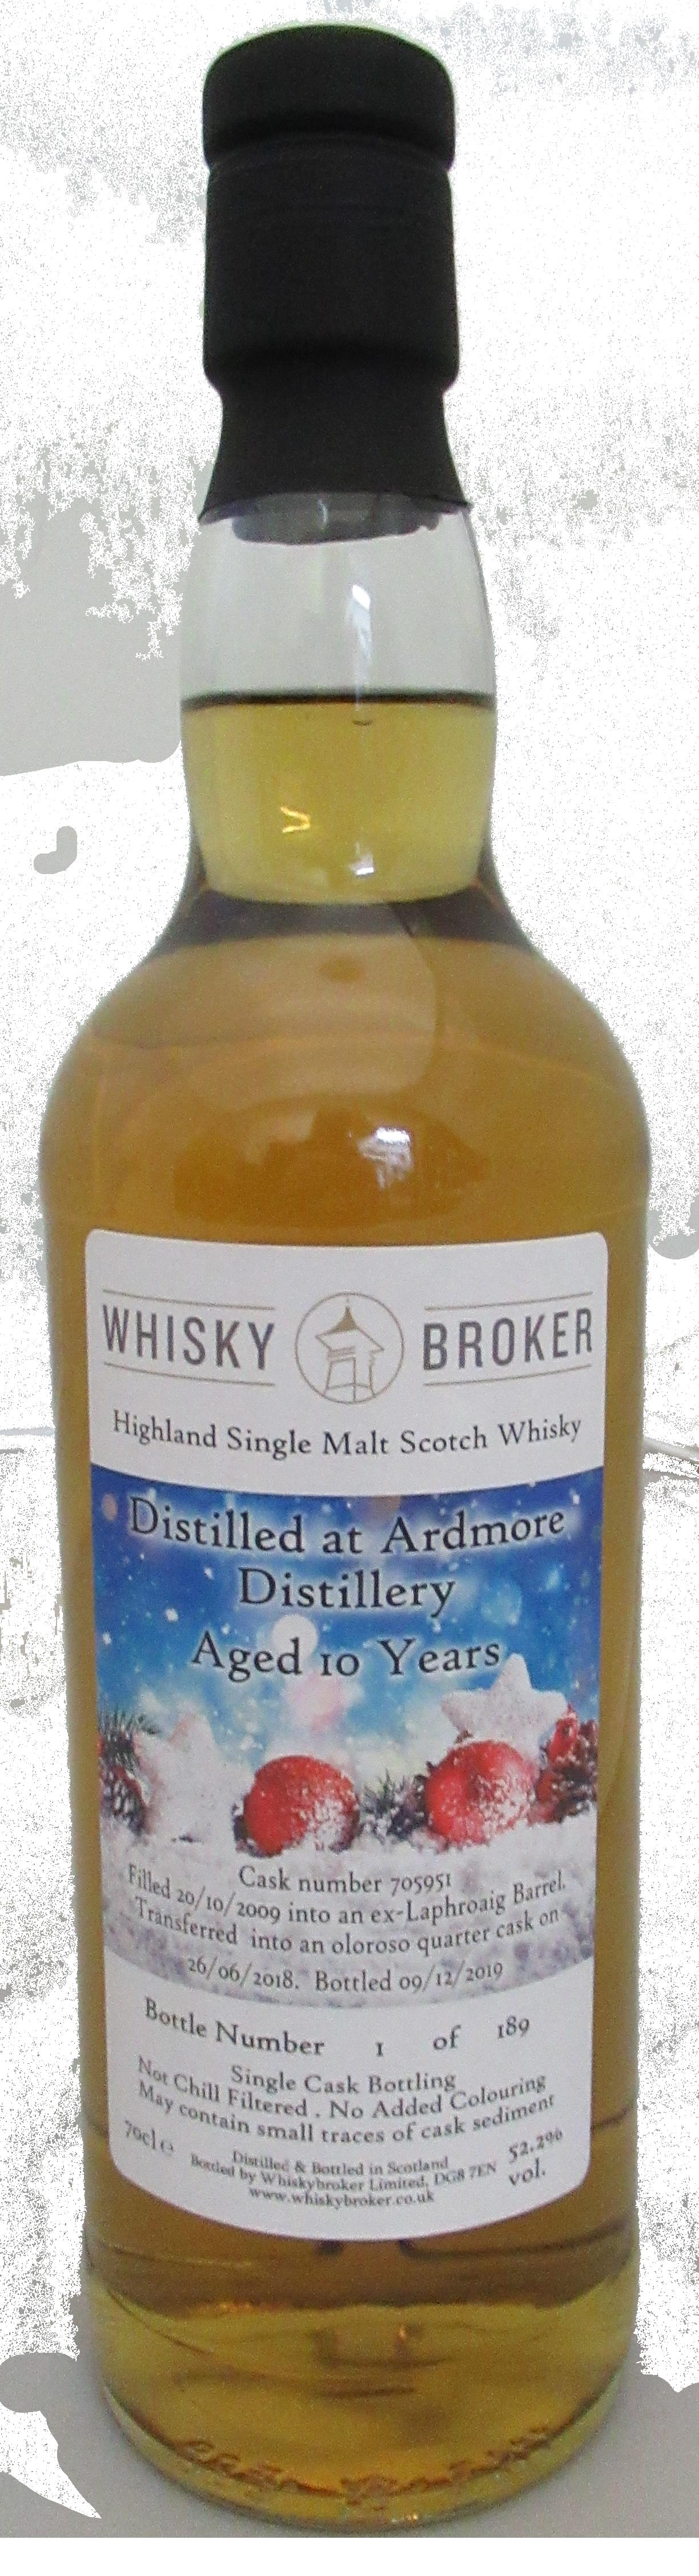 70cl, 10yo Distilled at Ardmore Distillery